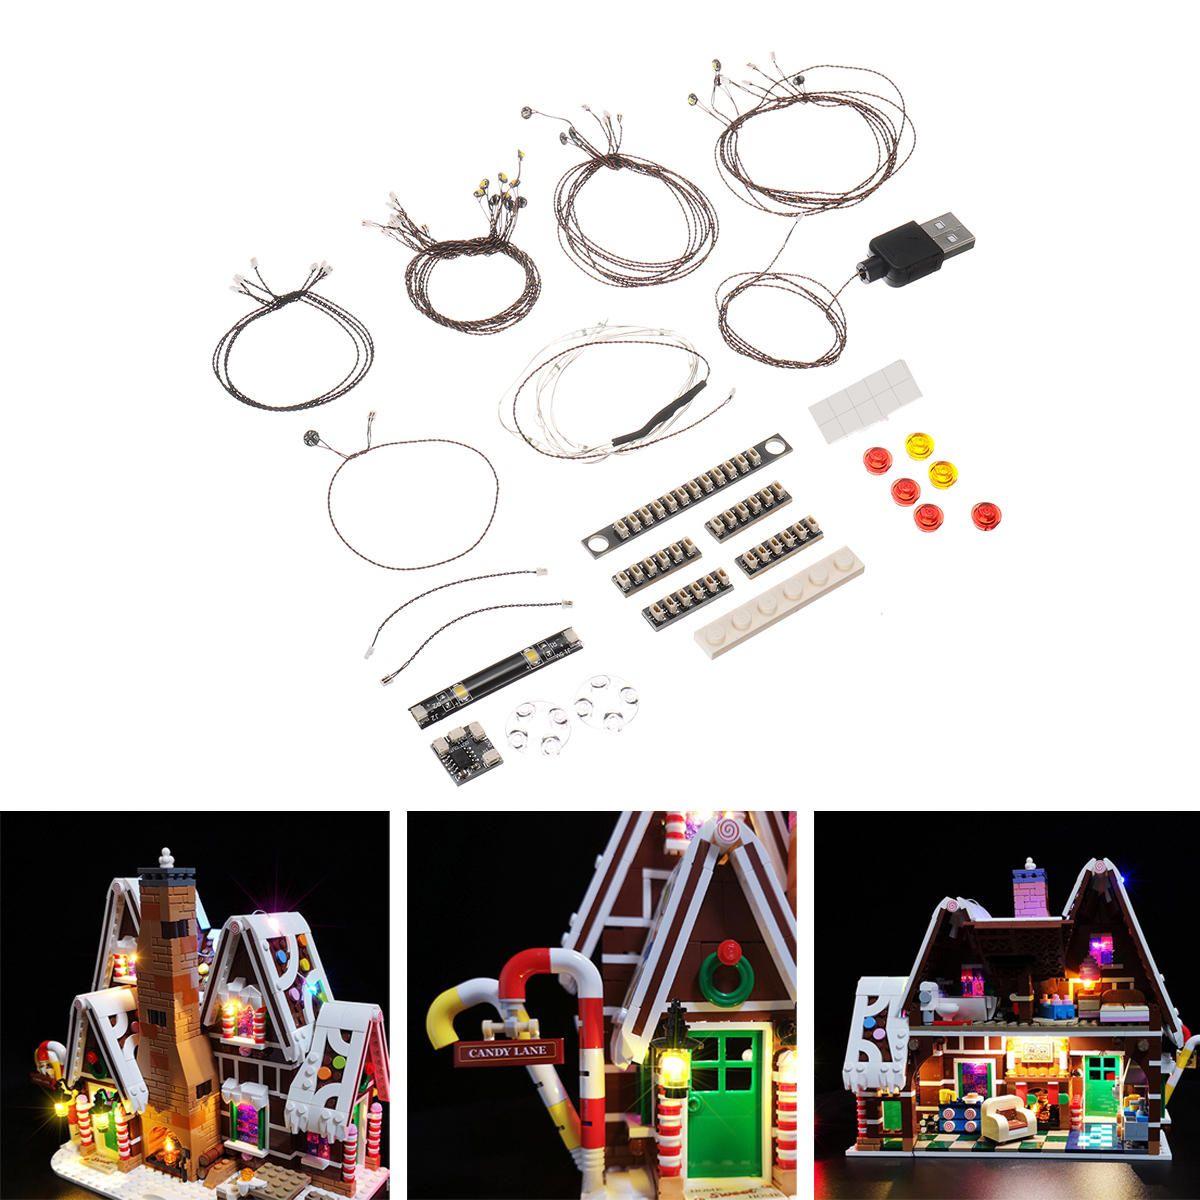 CRQ US$31.99 DIY LED Light String Kit Part For Lego 10267 House Model Building Gingerbread Flash